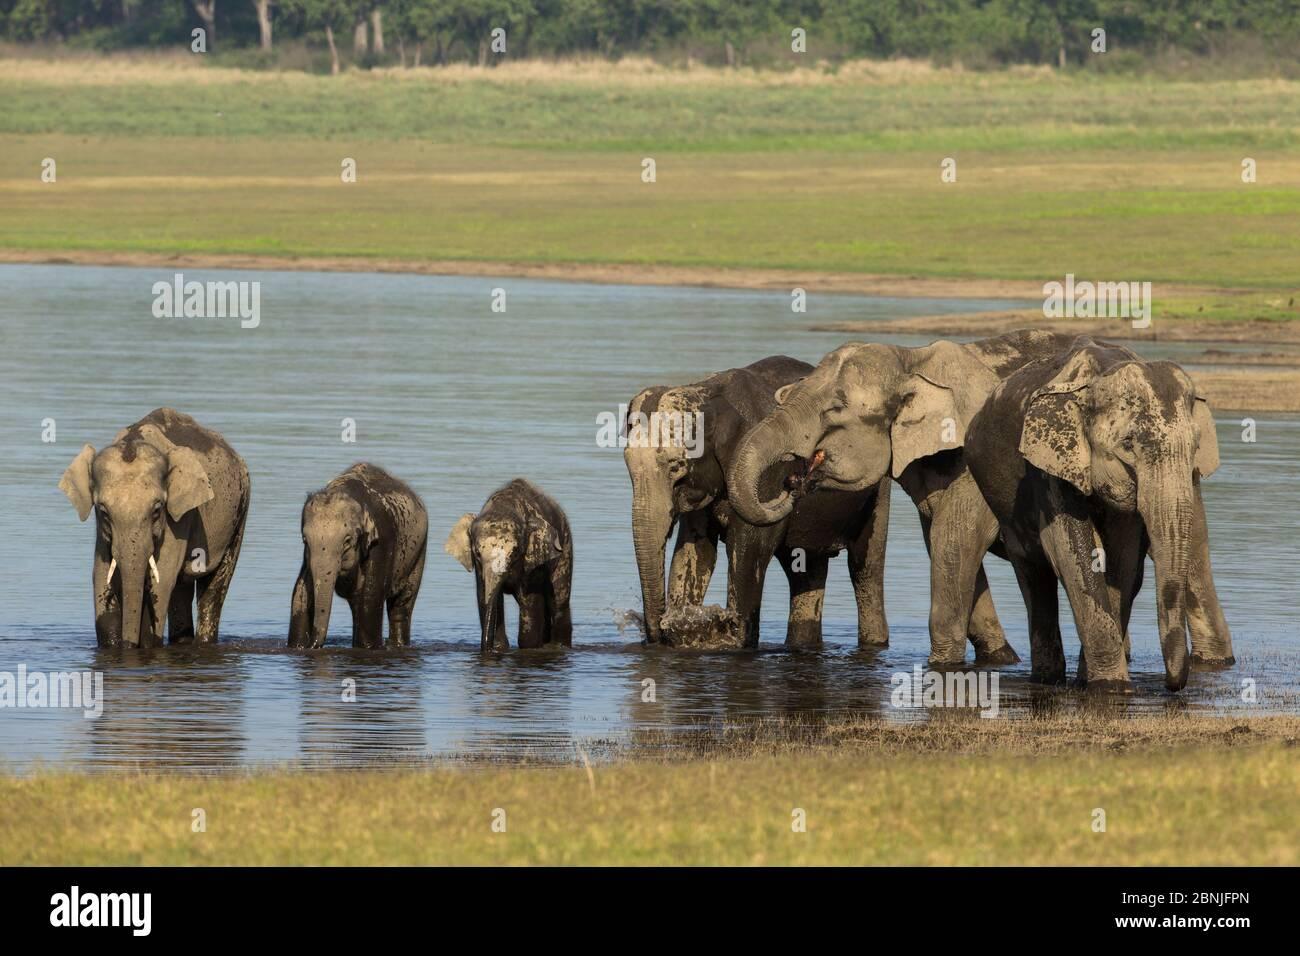 Elefante asiático (Elephas maximus), agua potable y baño familiar, Parque Nacional Jim Corbett, India. Foto de stock